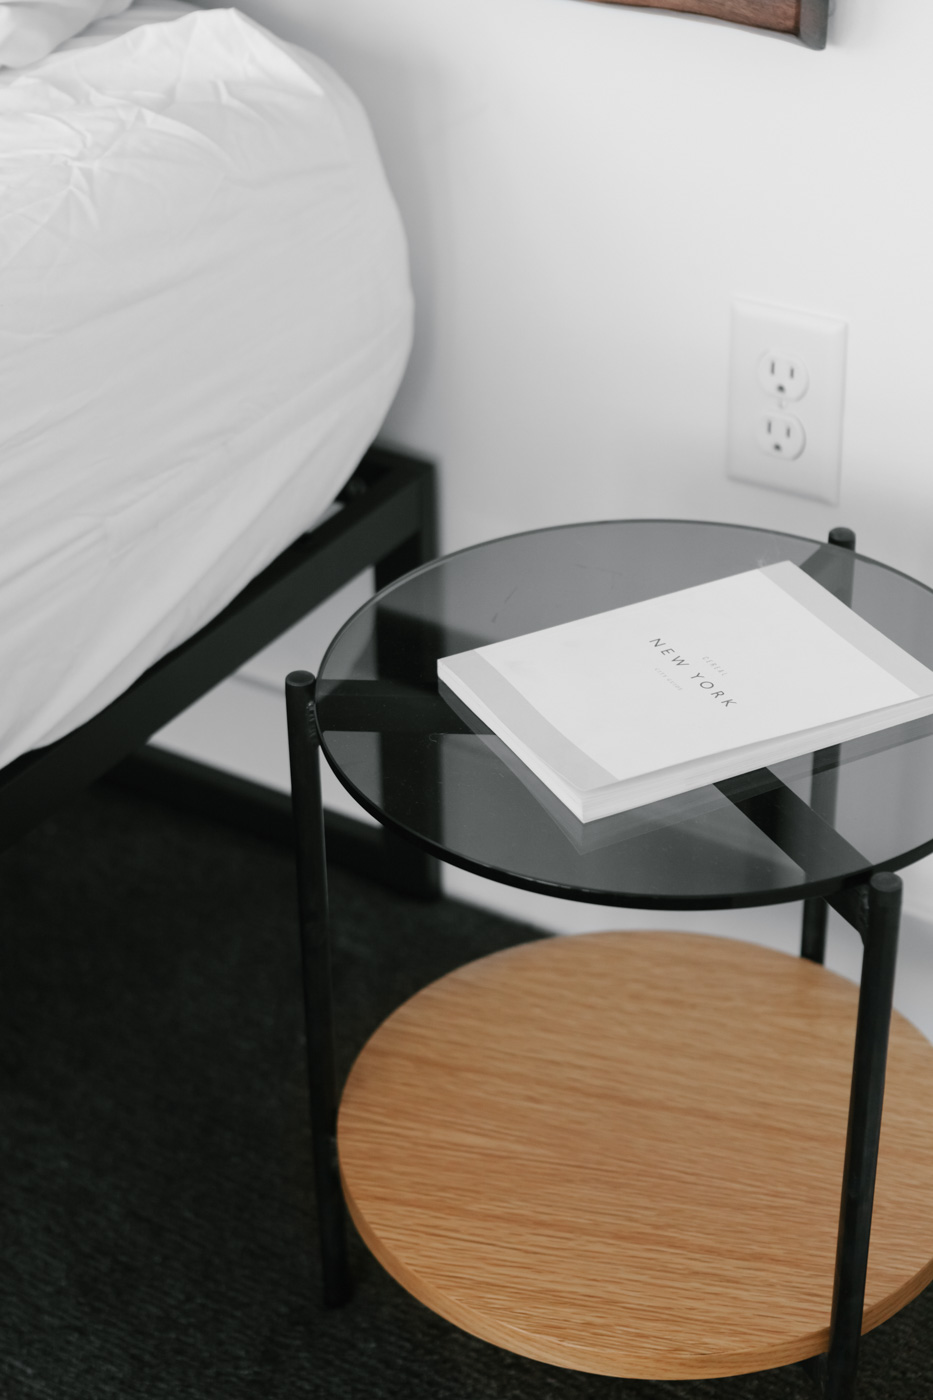 Atria-DenverCO-natural-light-photography-studio-lifestyle-photoshoot-location-editorial-commercial-photography-30.jpg